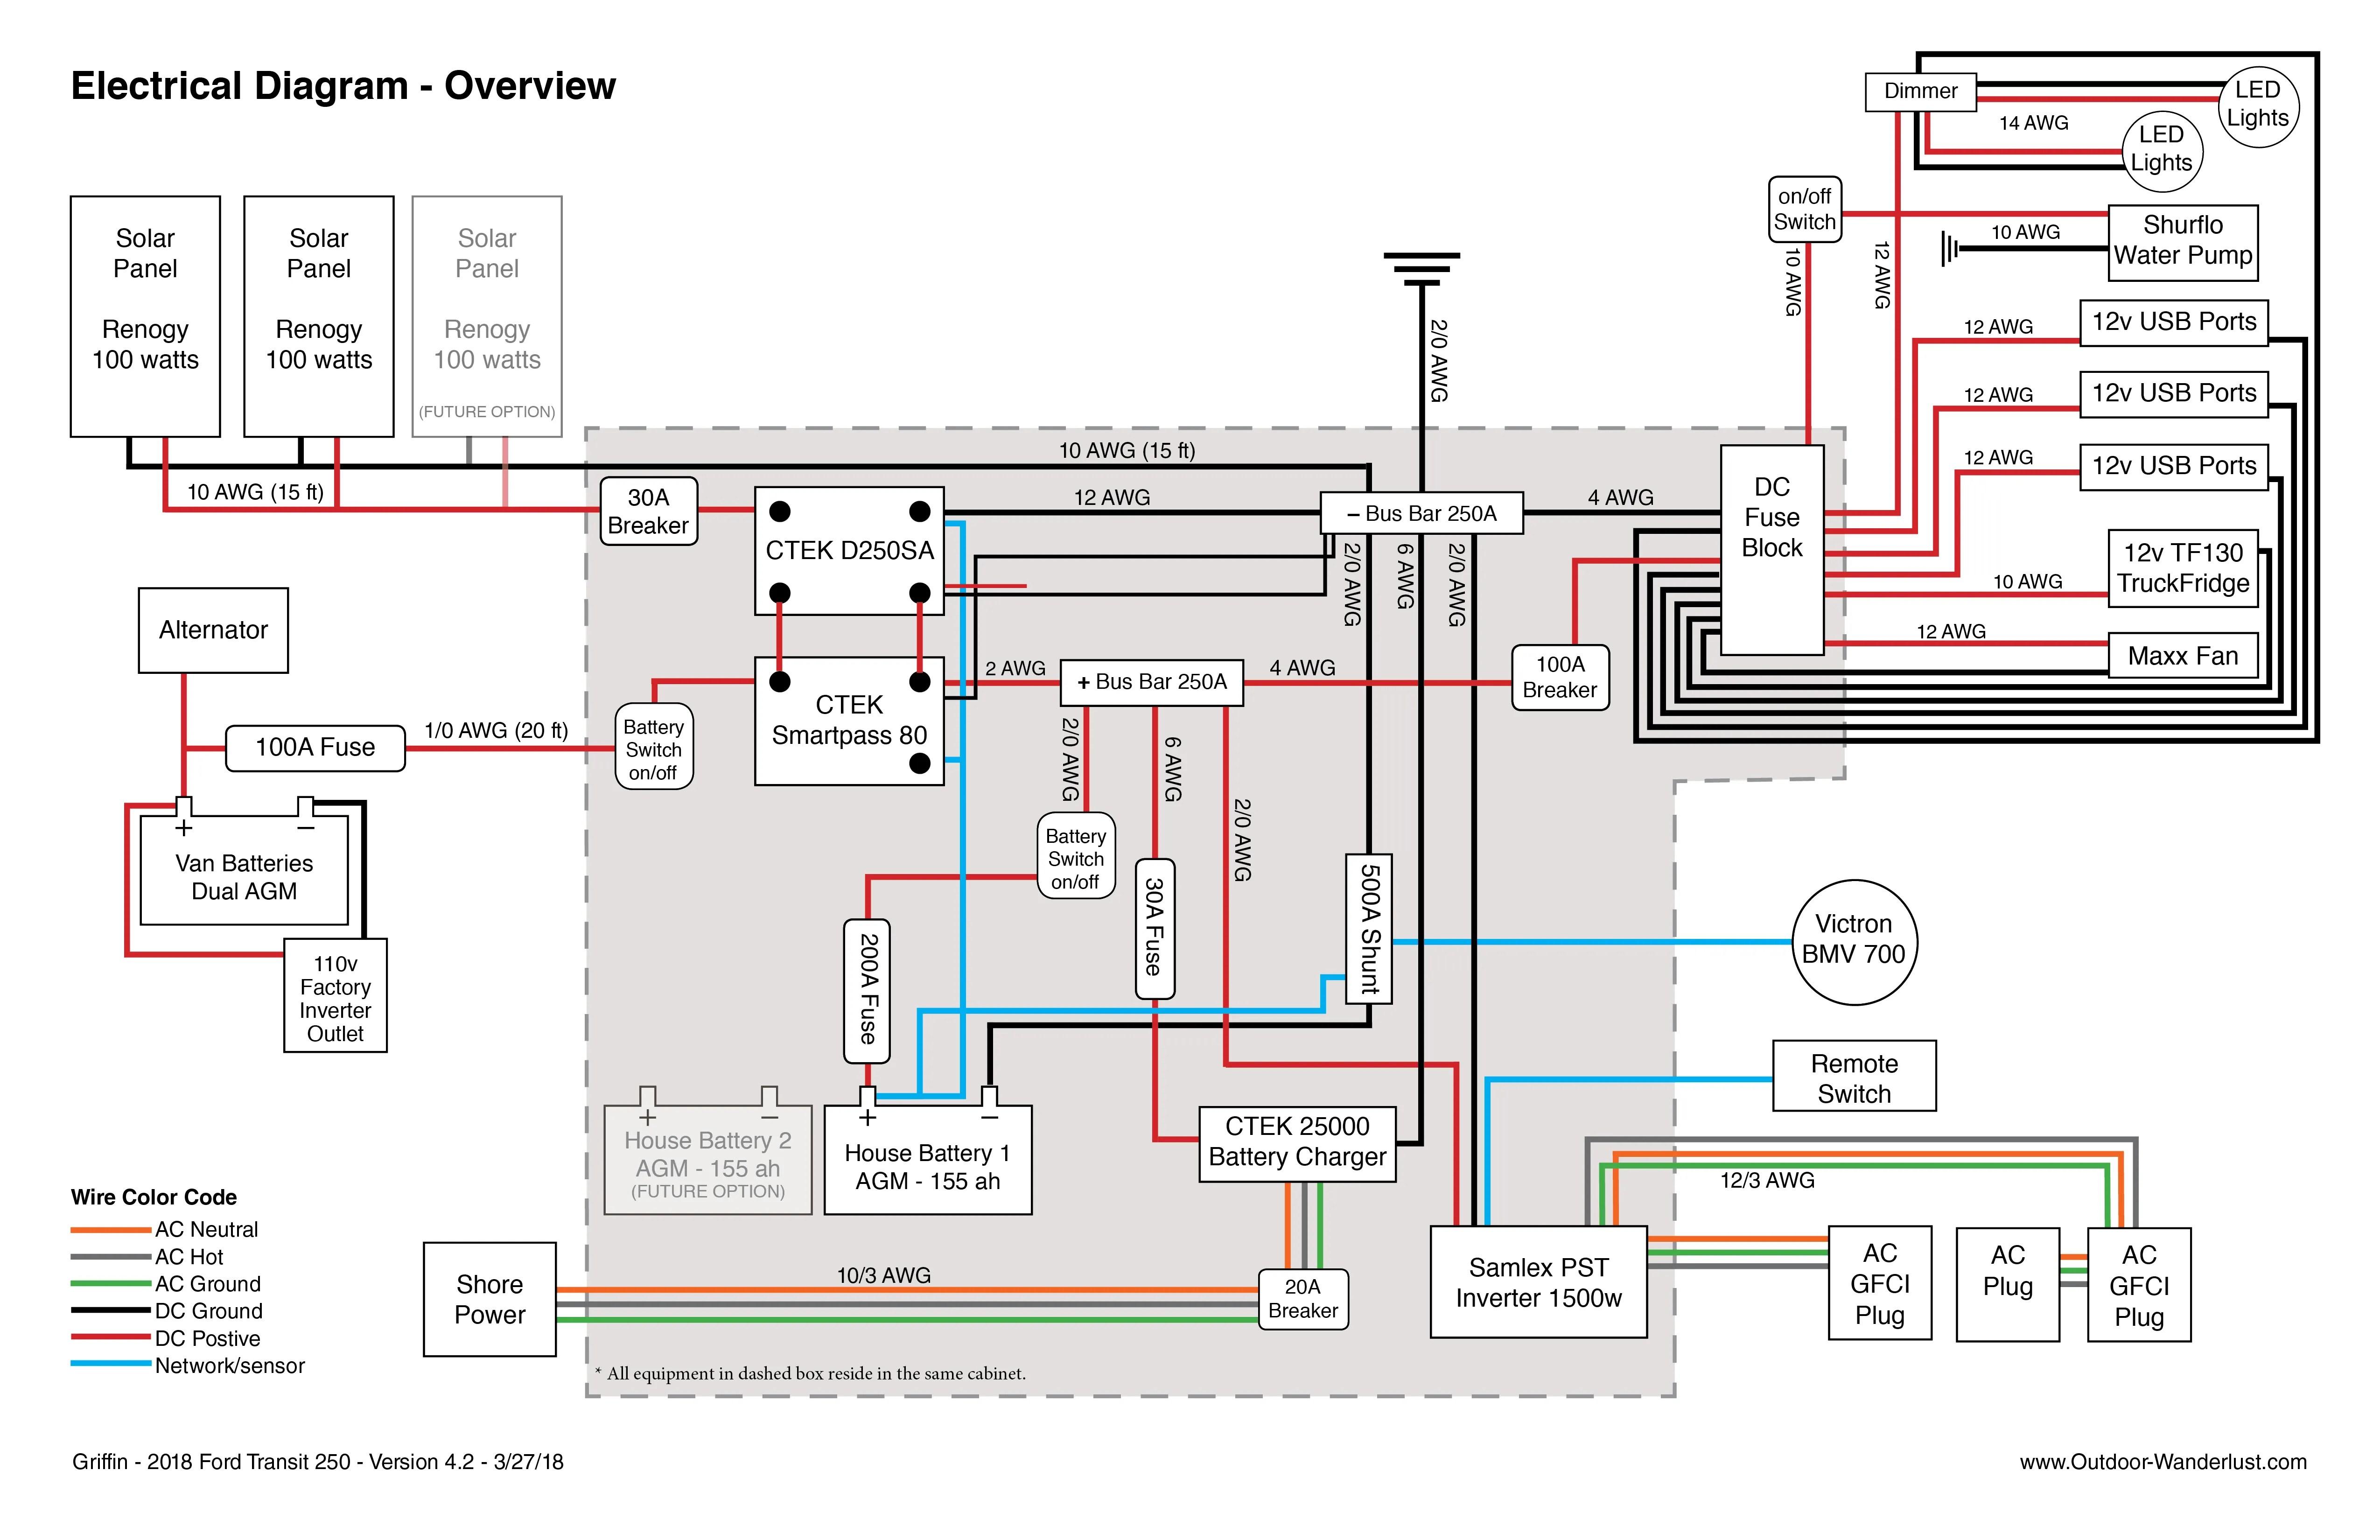 Transit Wiring Diagram v4 - Outdoor WanderlustOutdoor Wanderlust